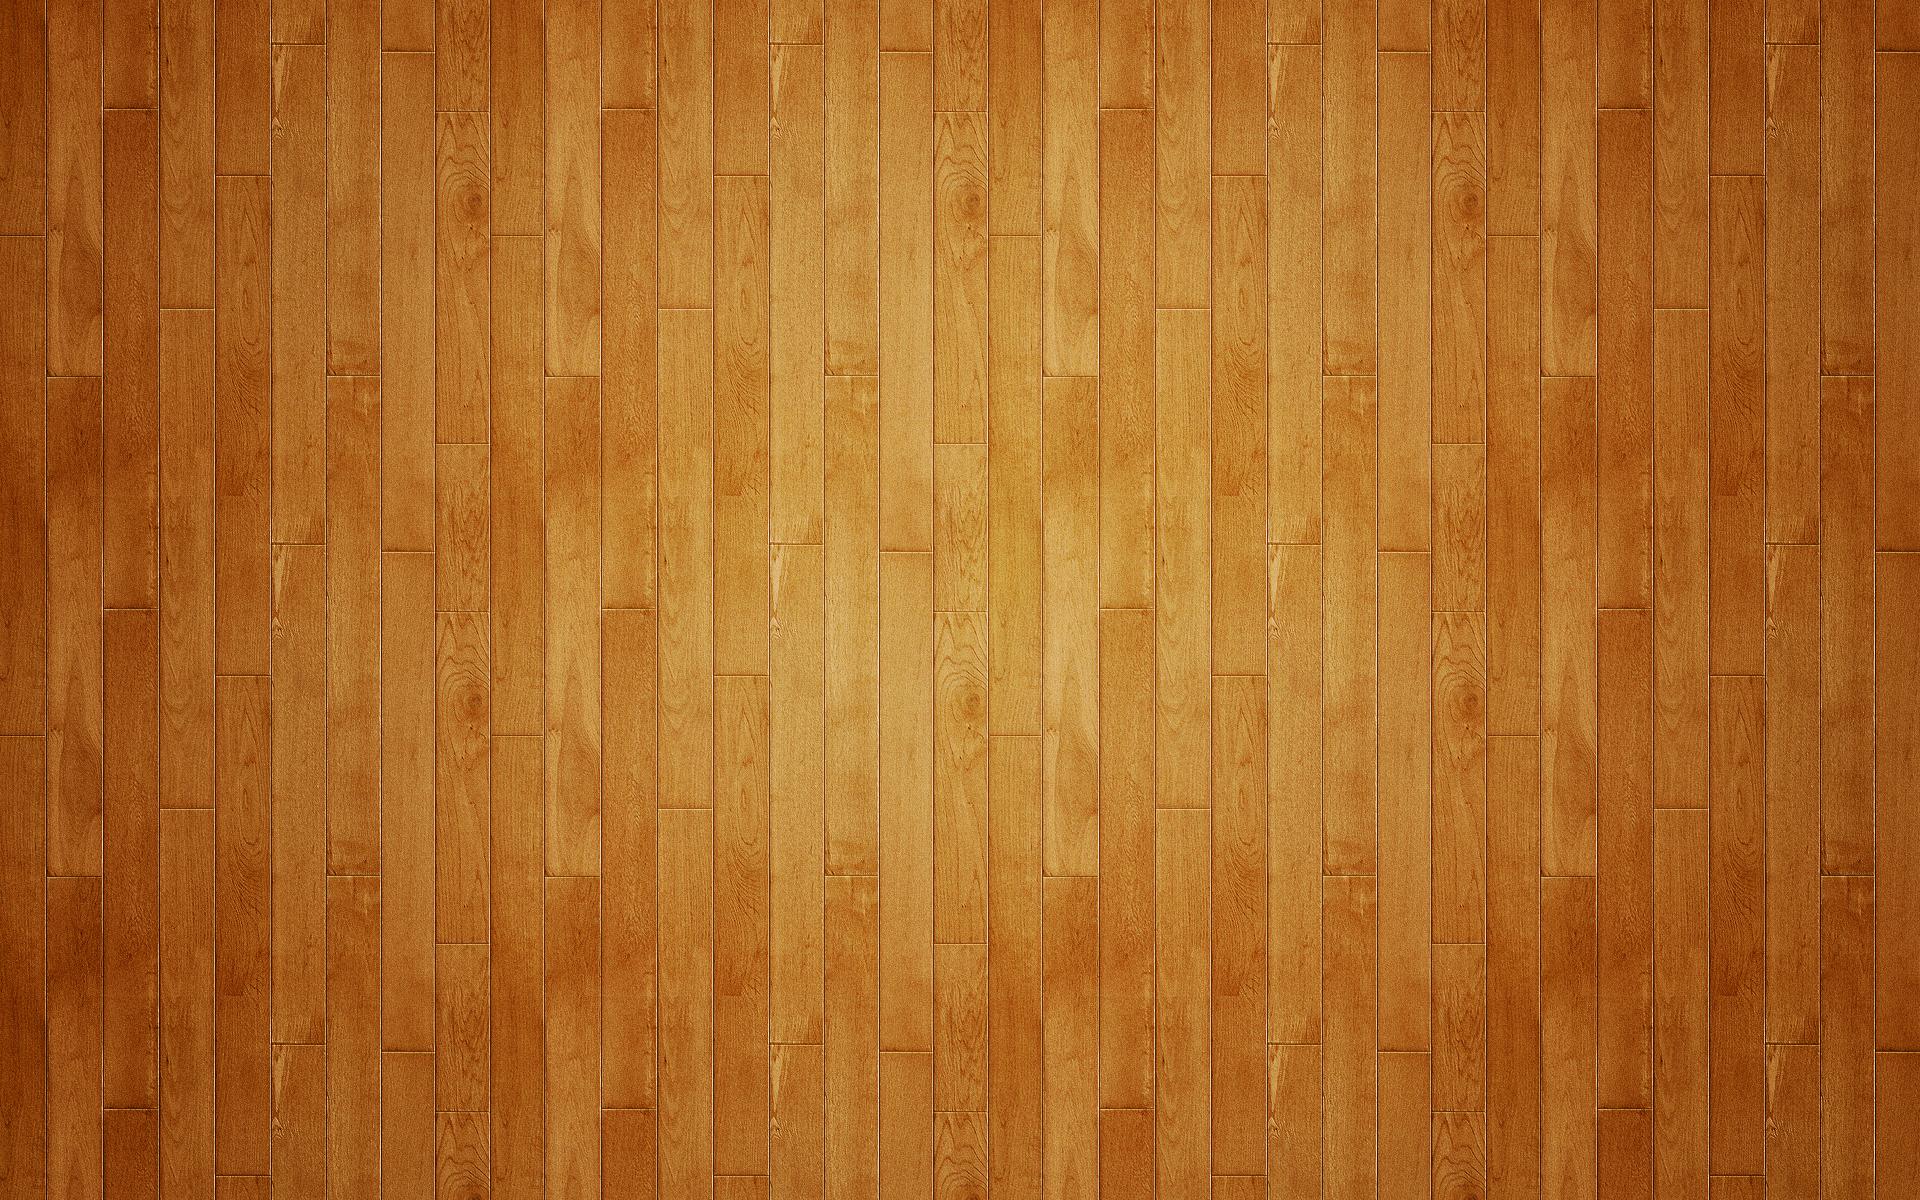 19 Wood Flooring Background For Photoshop Images Wood Floor